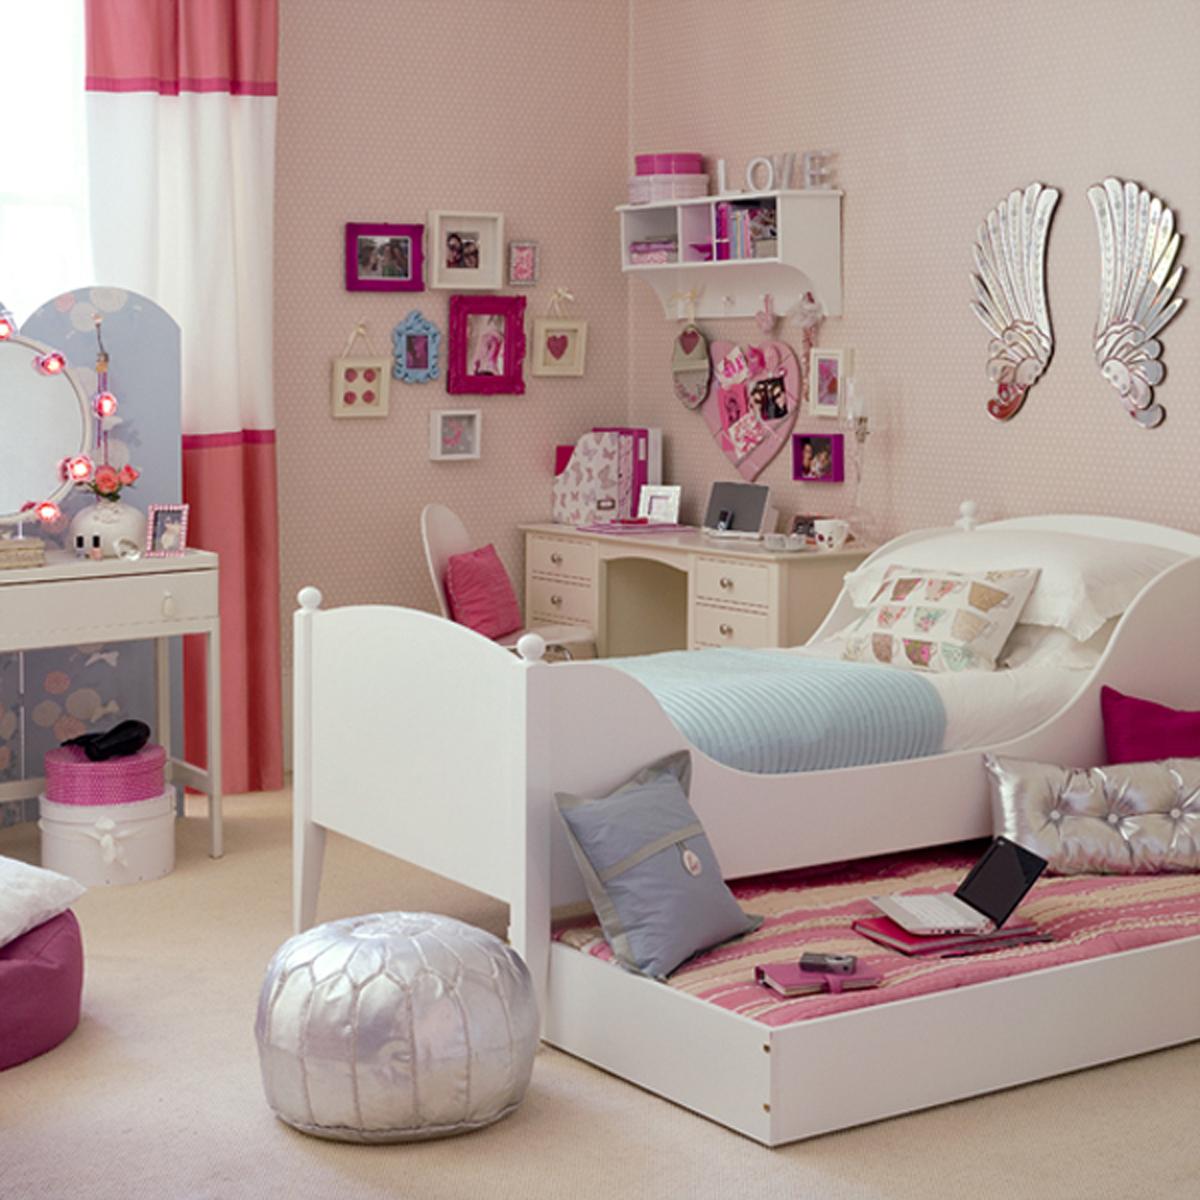 Girl Bedroom Design Idea. 14 inspirational bedroom design ideas for ...